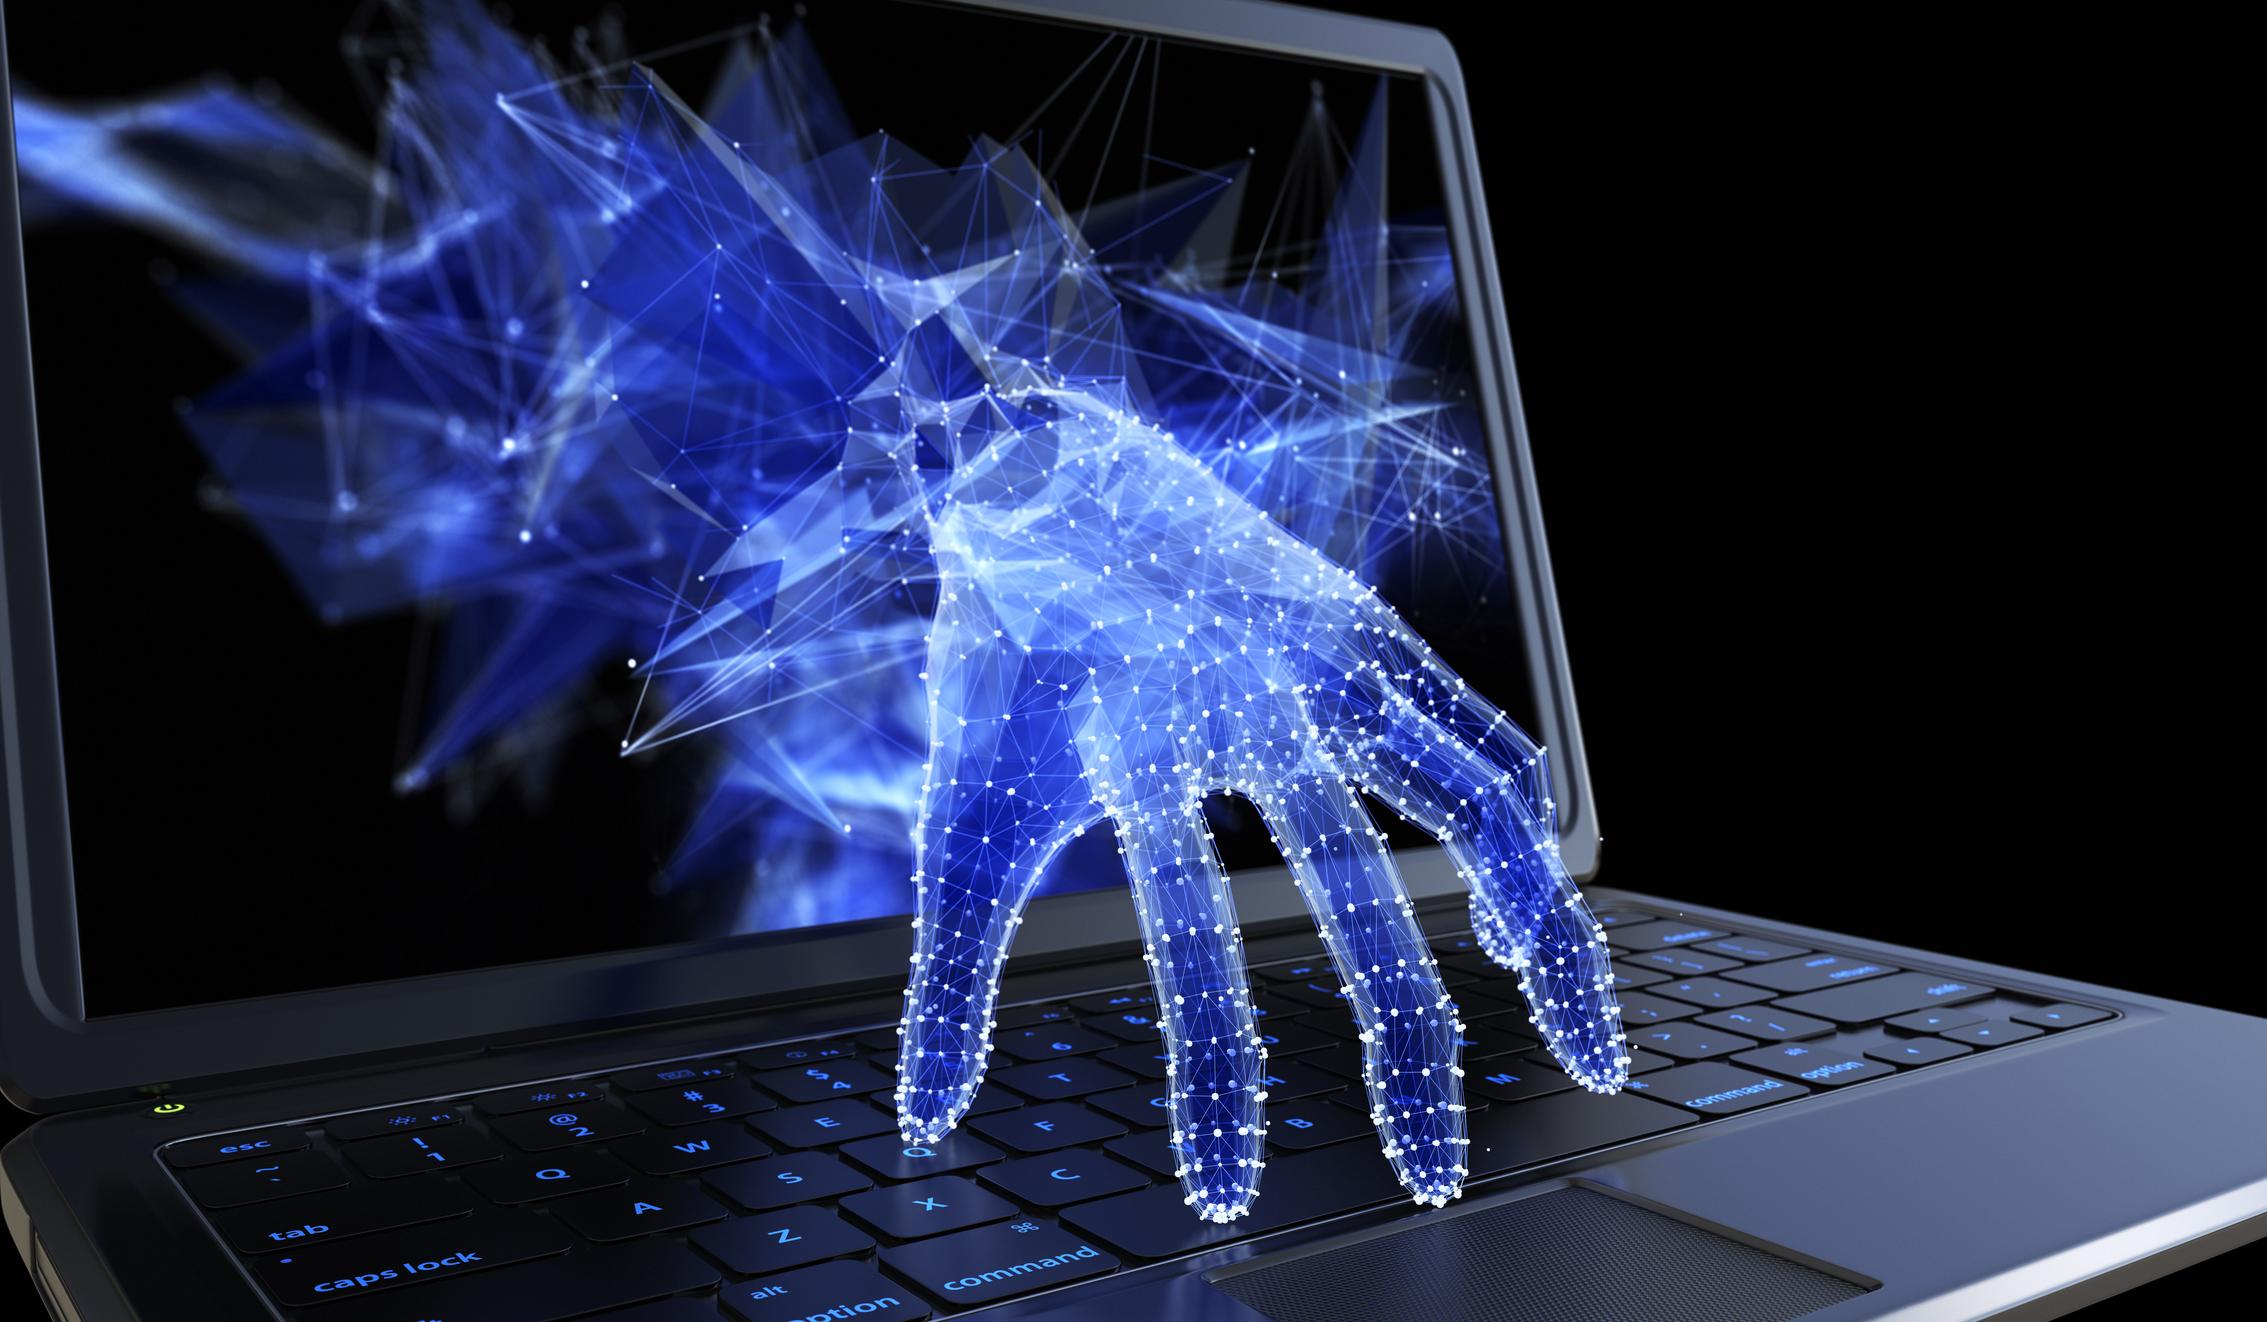 безпека персональних даних